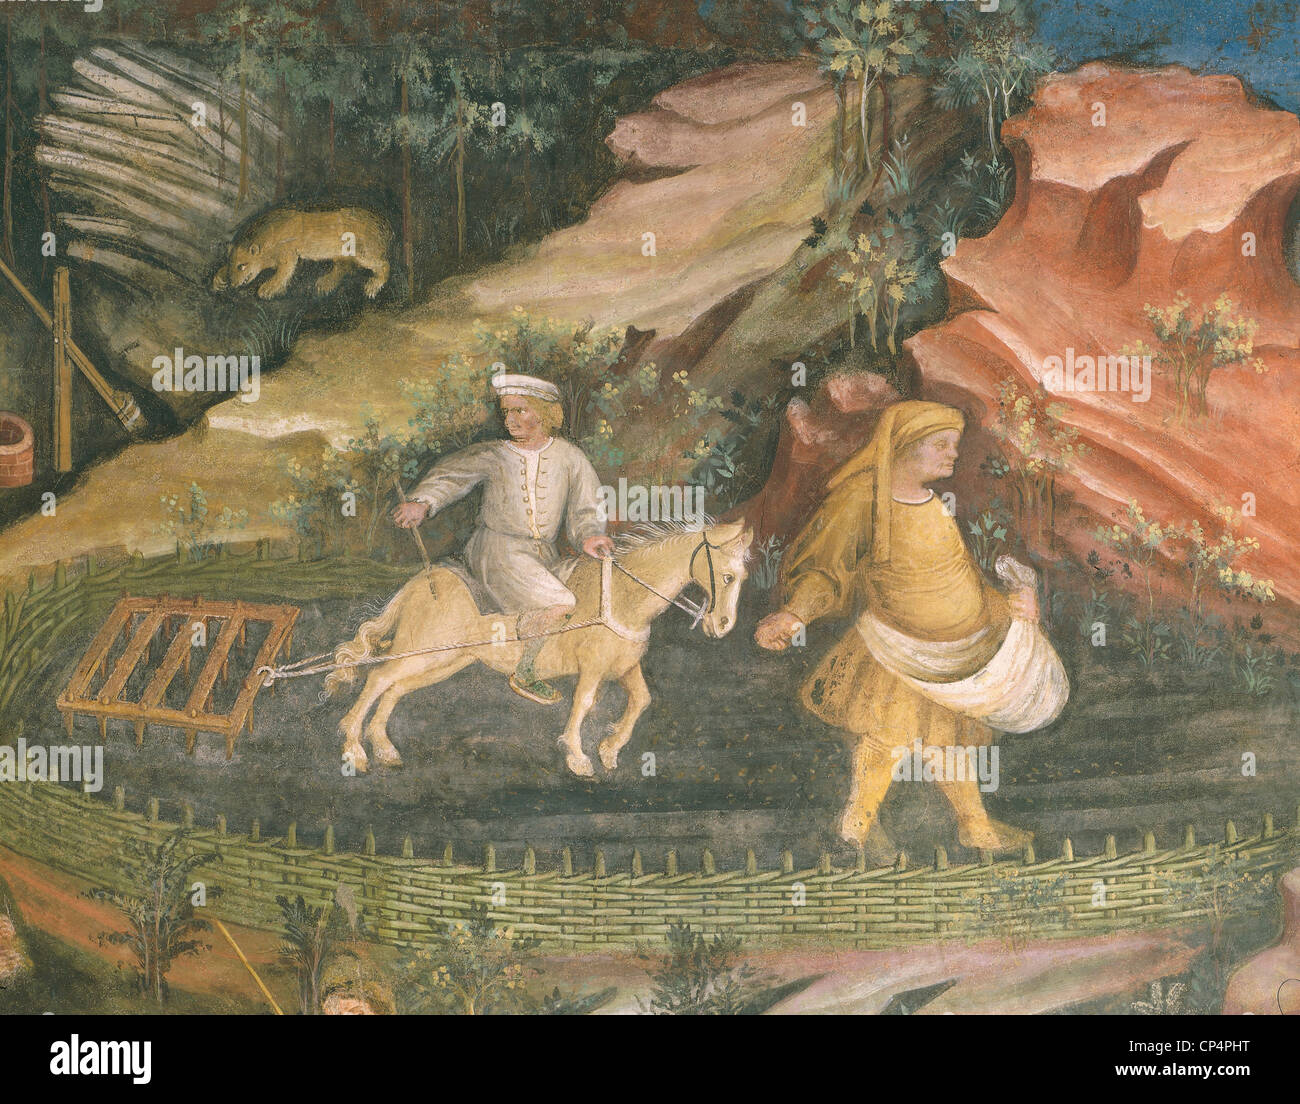 Fresque Buonconsiglio Trento Photo Stock